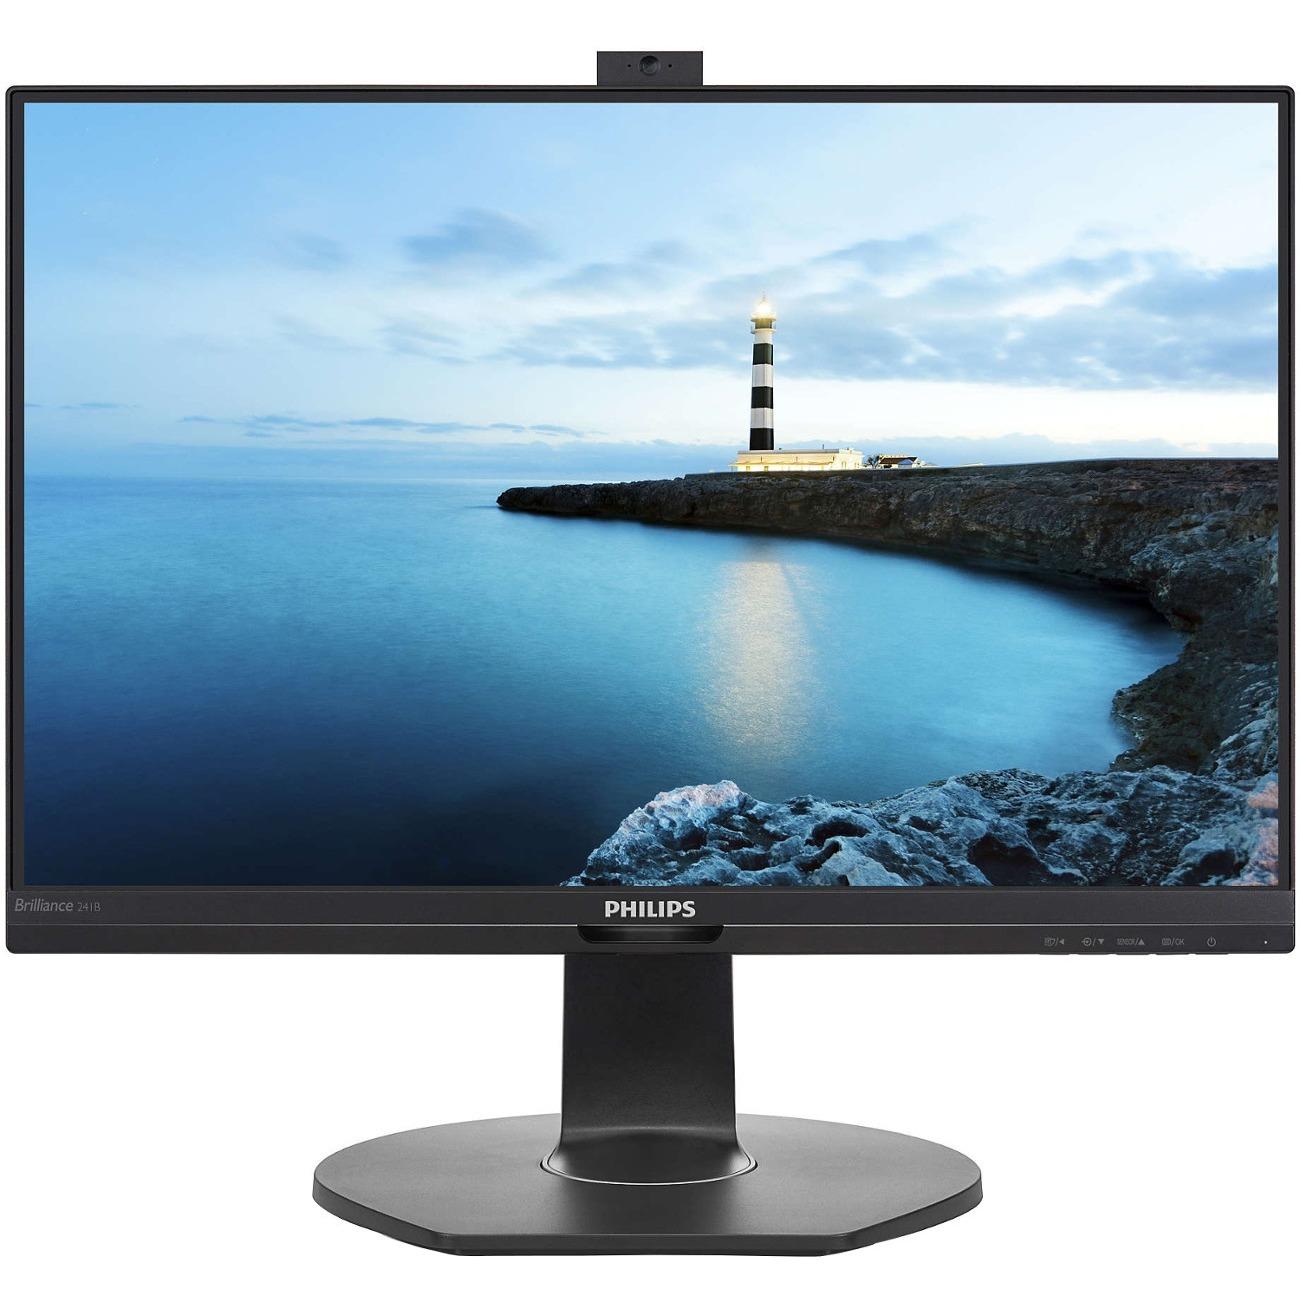 "Philips Brilliance 241B7QPJKEB 23.8"" Full HD LED LCD Monitor - 16:9 - Textured Black_subImage_1"